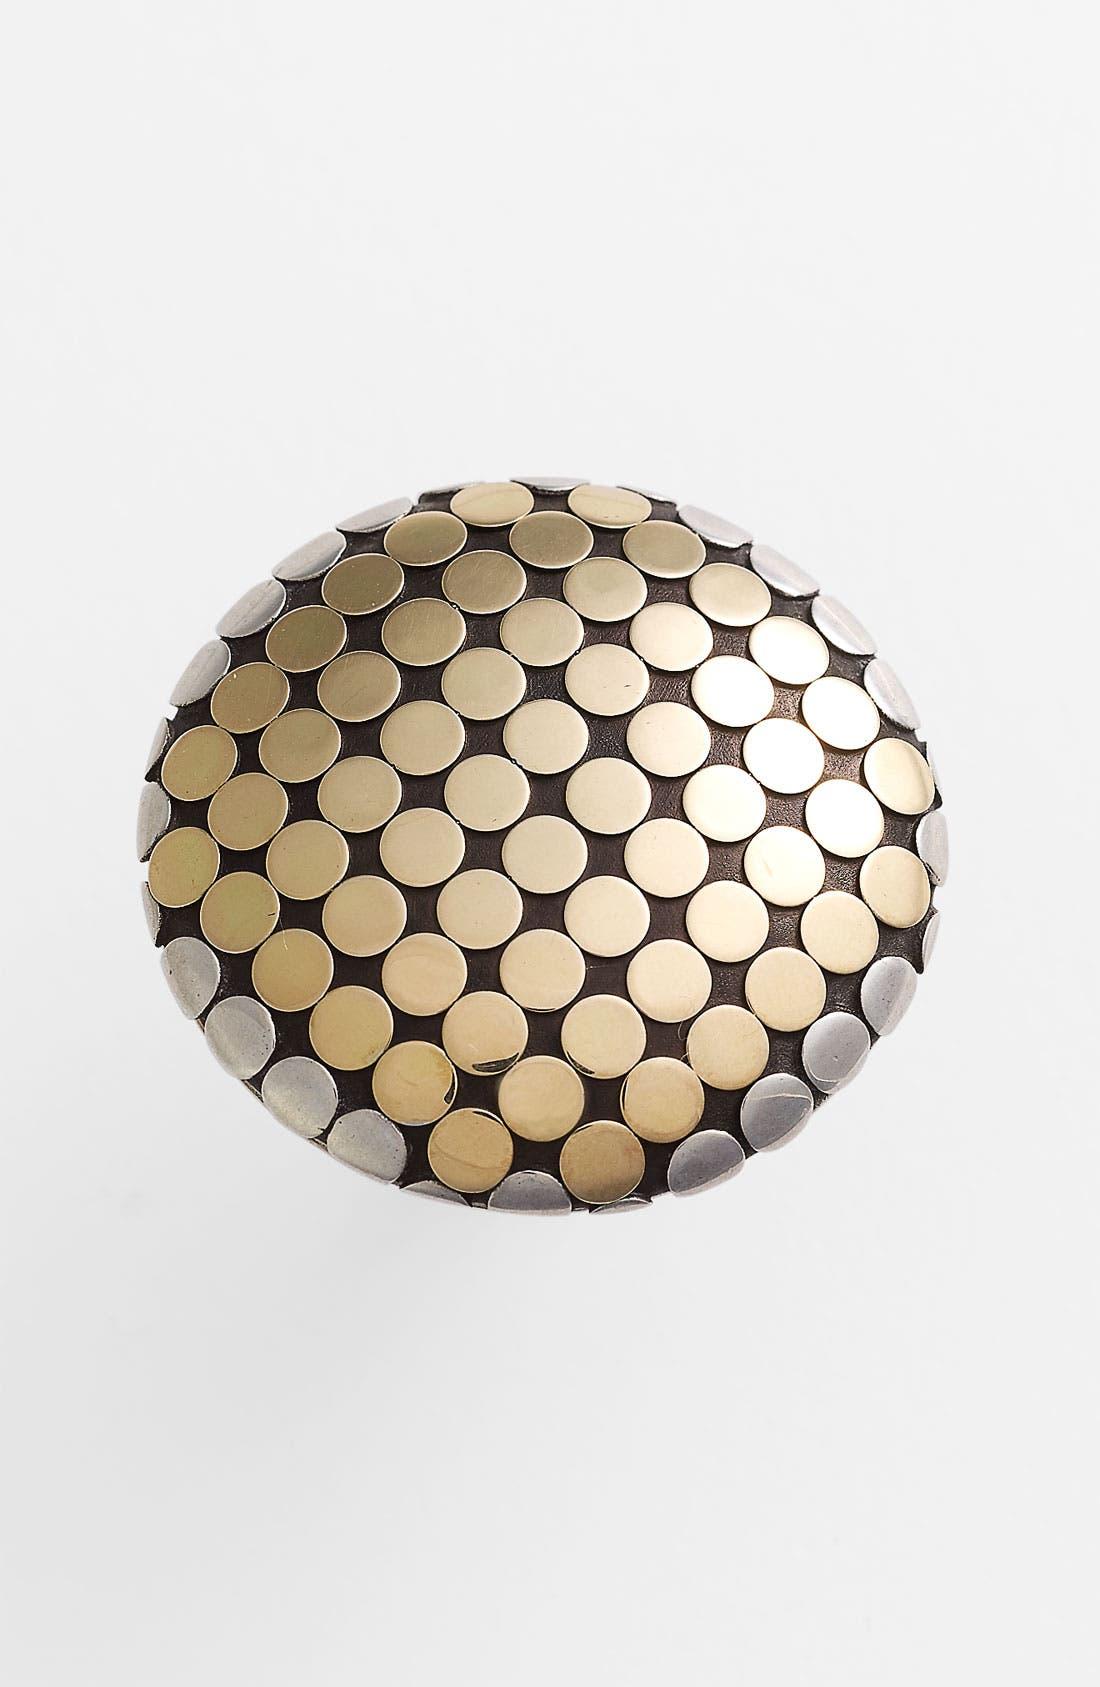 Alternate Image 1 Selected - John Hardy 'Dot Gold & Silver' Round Ring